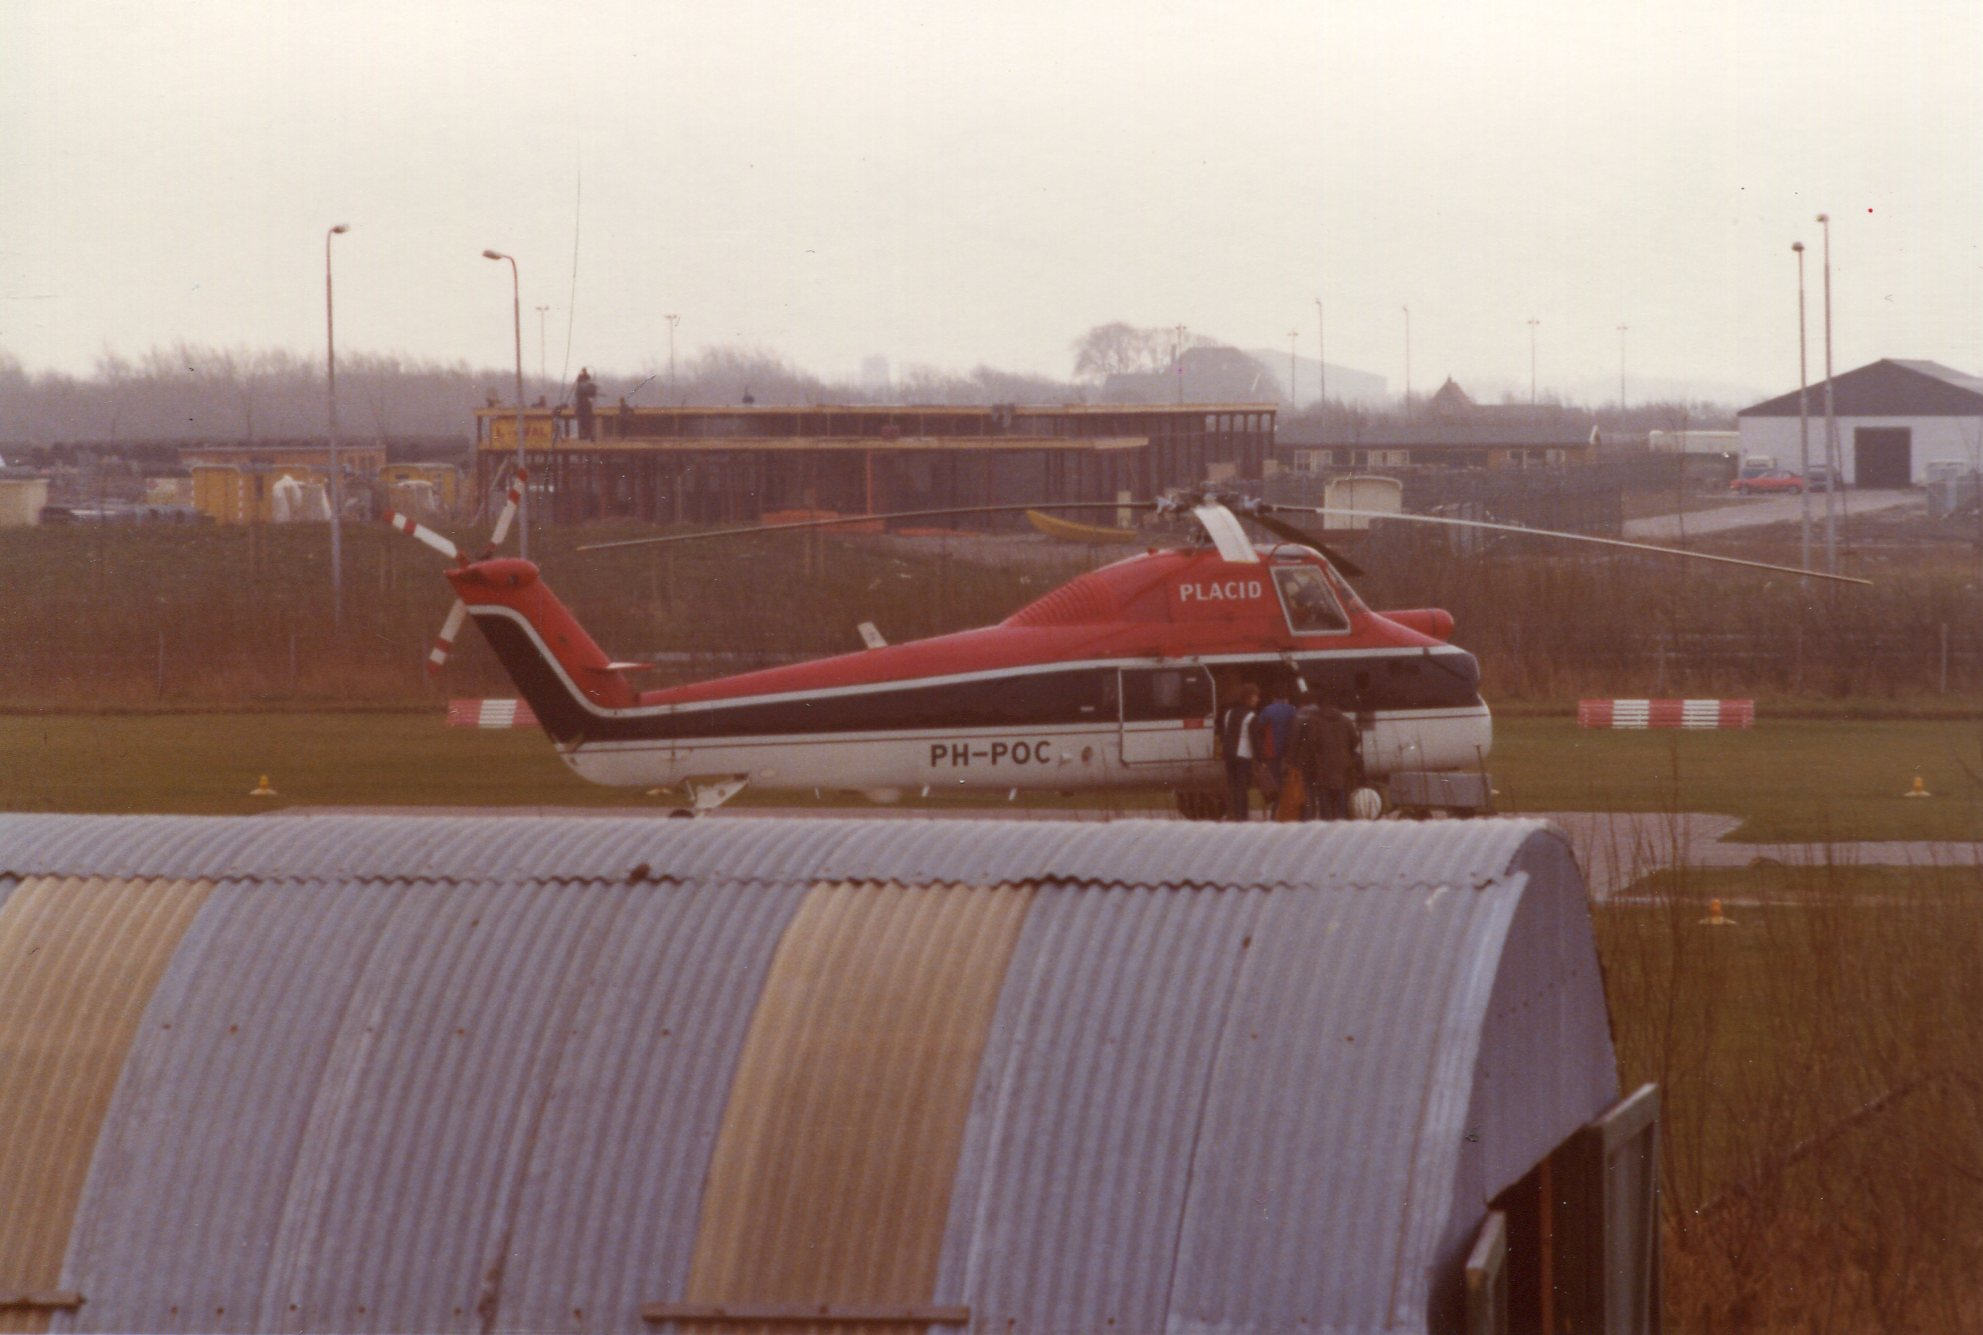 Naam: Den Helder , april 1977 (2).jpg Bekeken: 445 Grootte: 271,9 KB